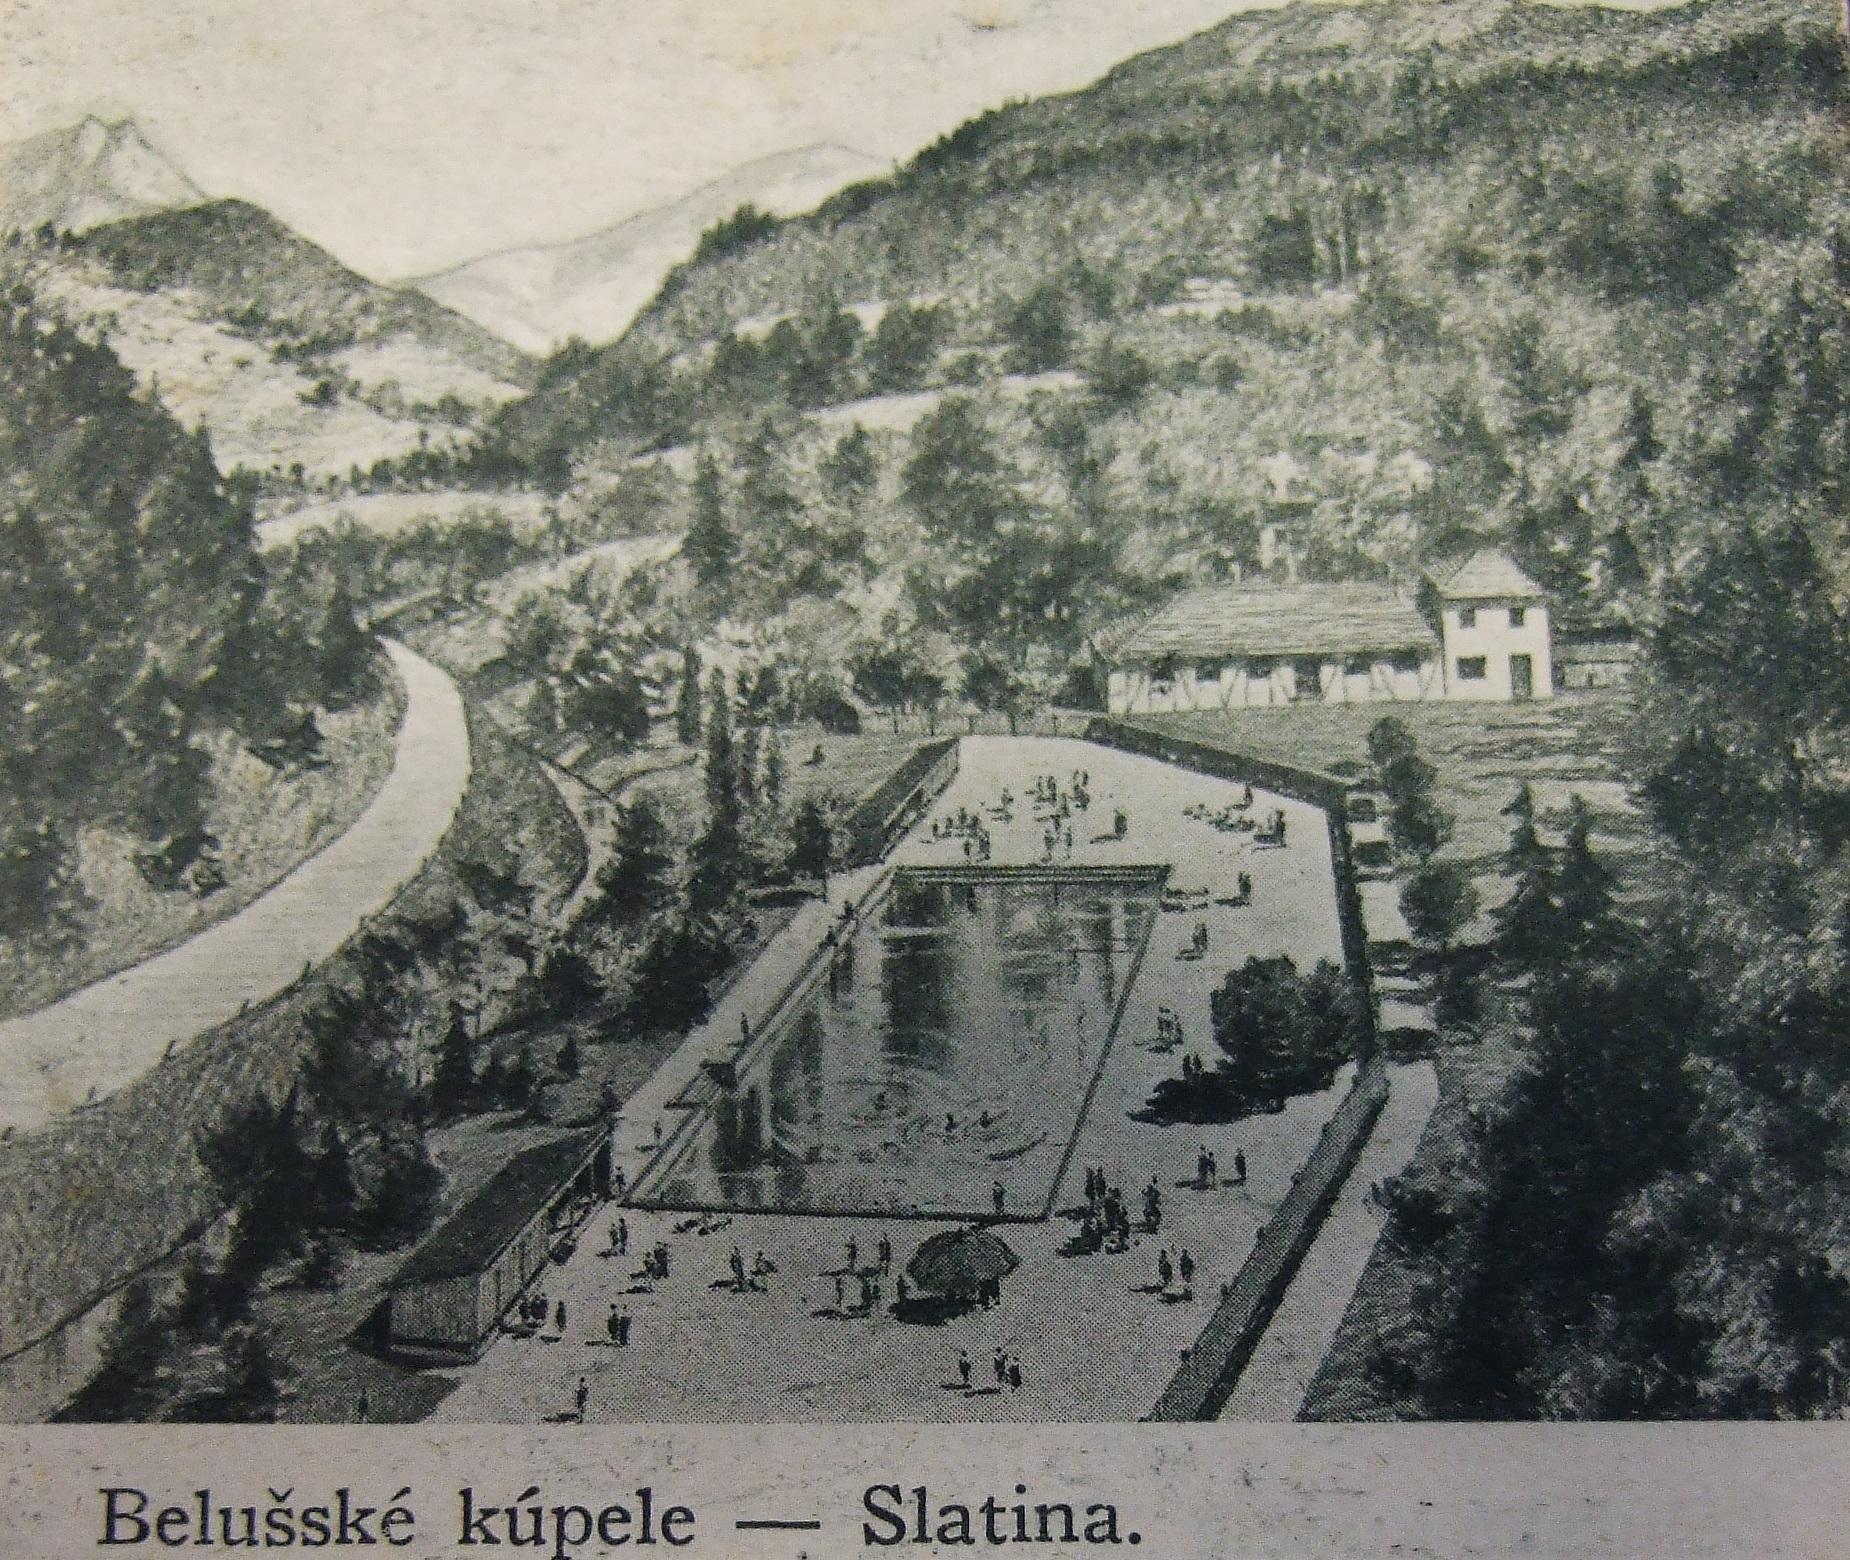 Kreslené kúpalisko v Belušských Slatinách v 1. polovici 20. storočia (S. Kopencová)